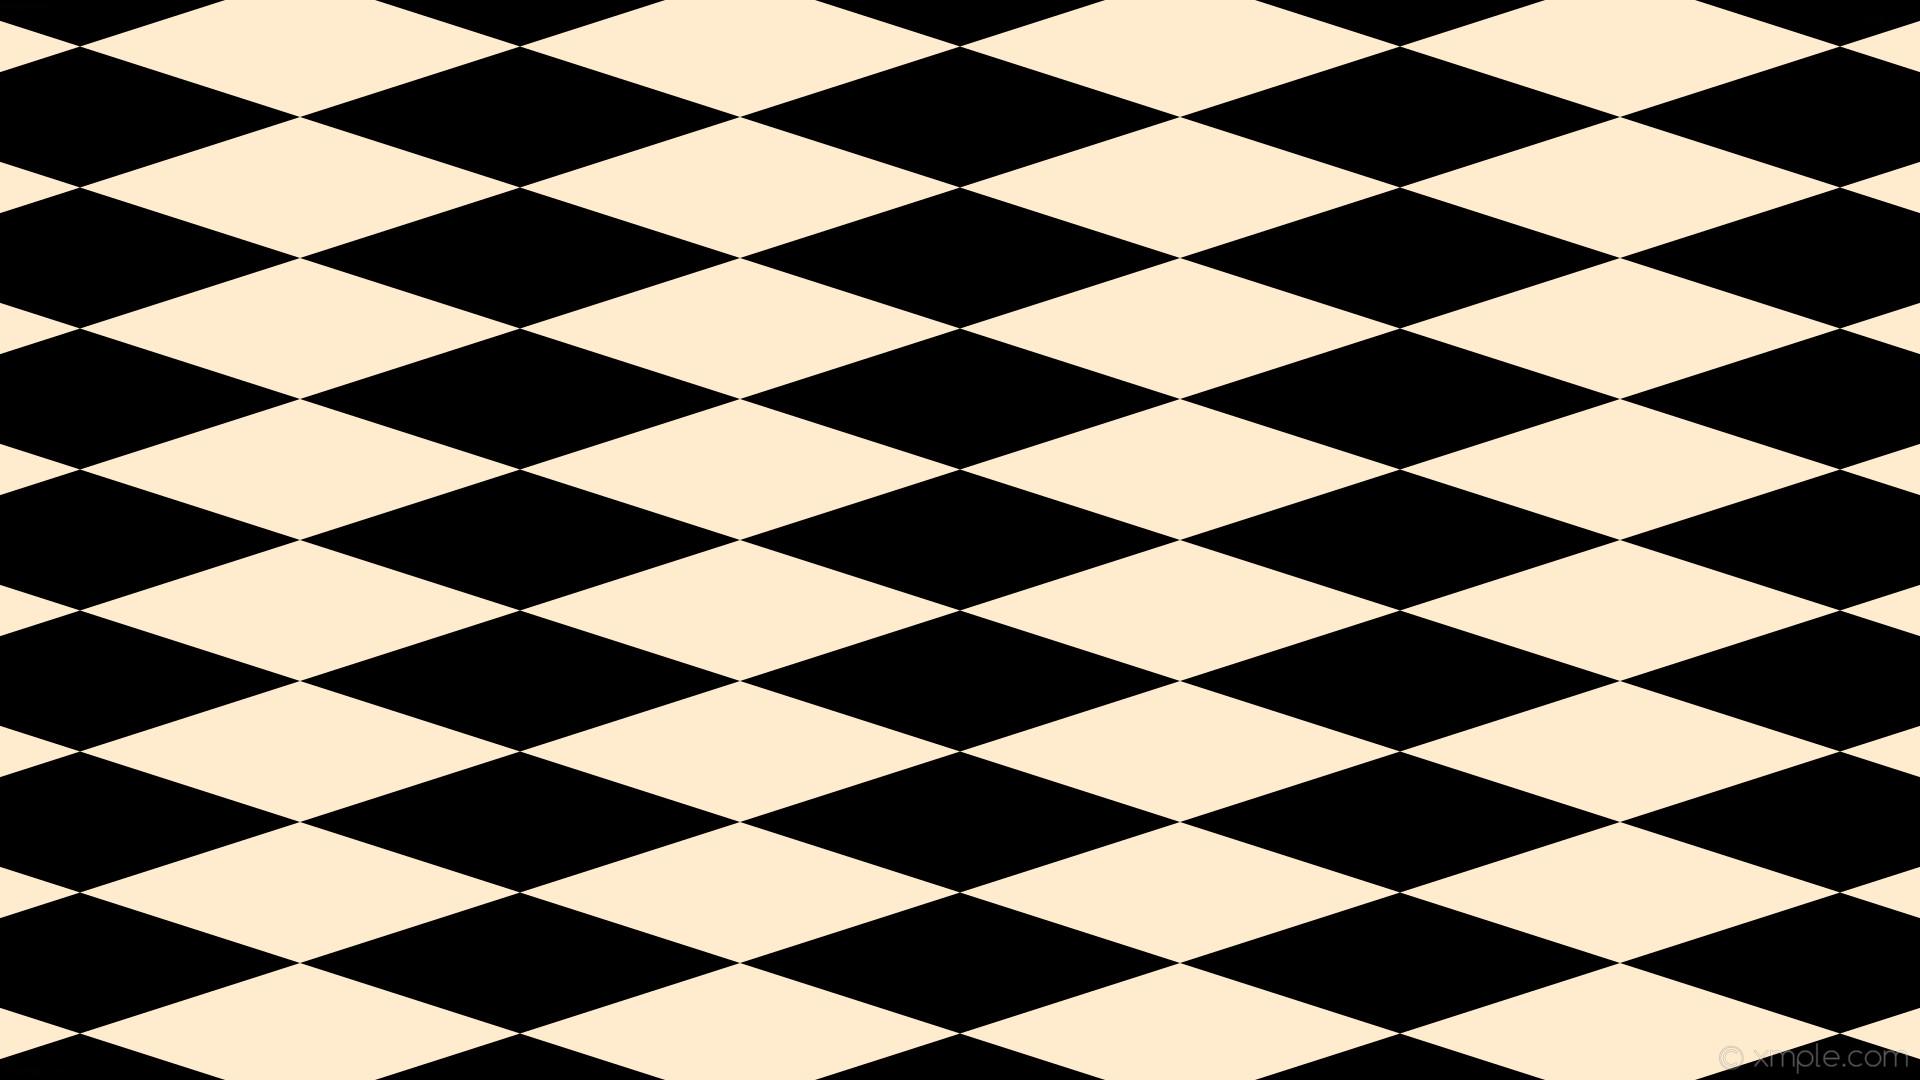 1920x1080 Wallpaper Rhombus Diamond Black White Lozenge Snow Fffafa 000000 0A 260px 63px